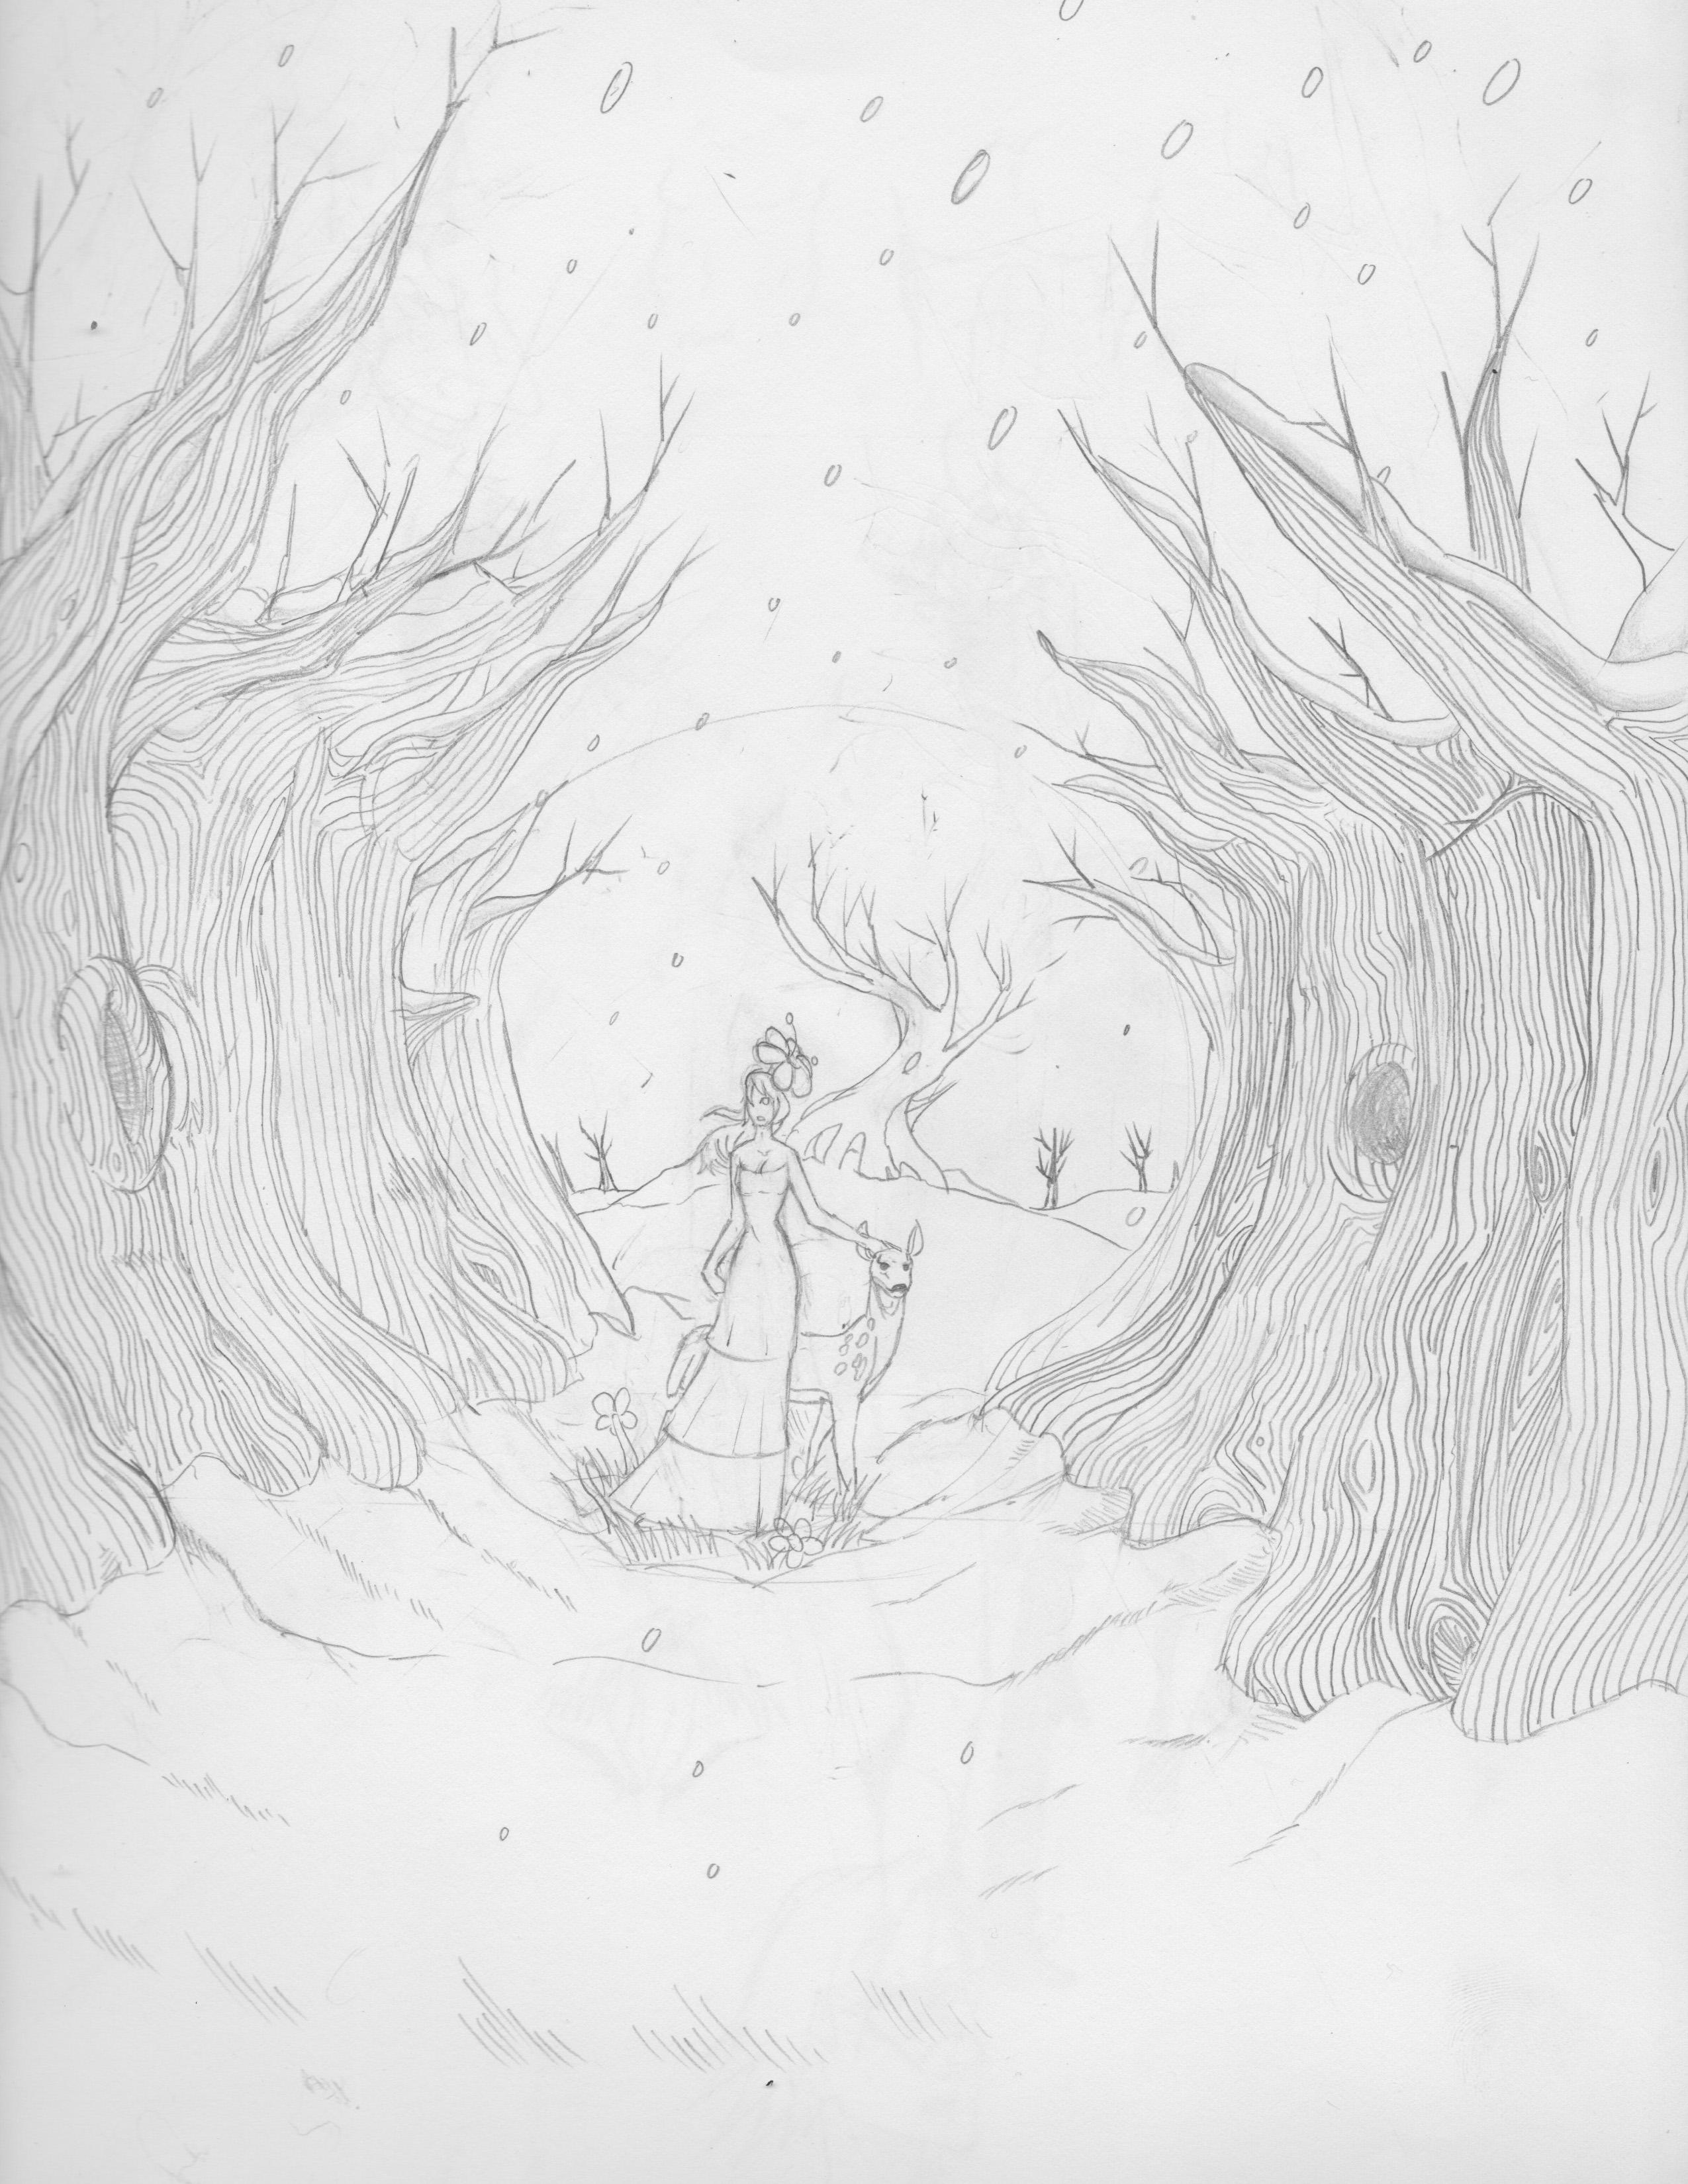 Springing Winter - Pre-Sketch/ Drawing